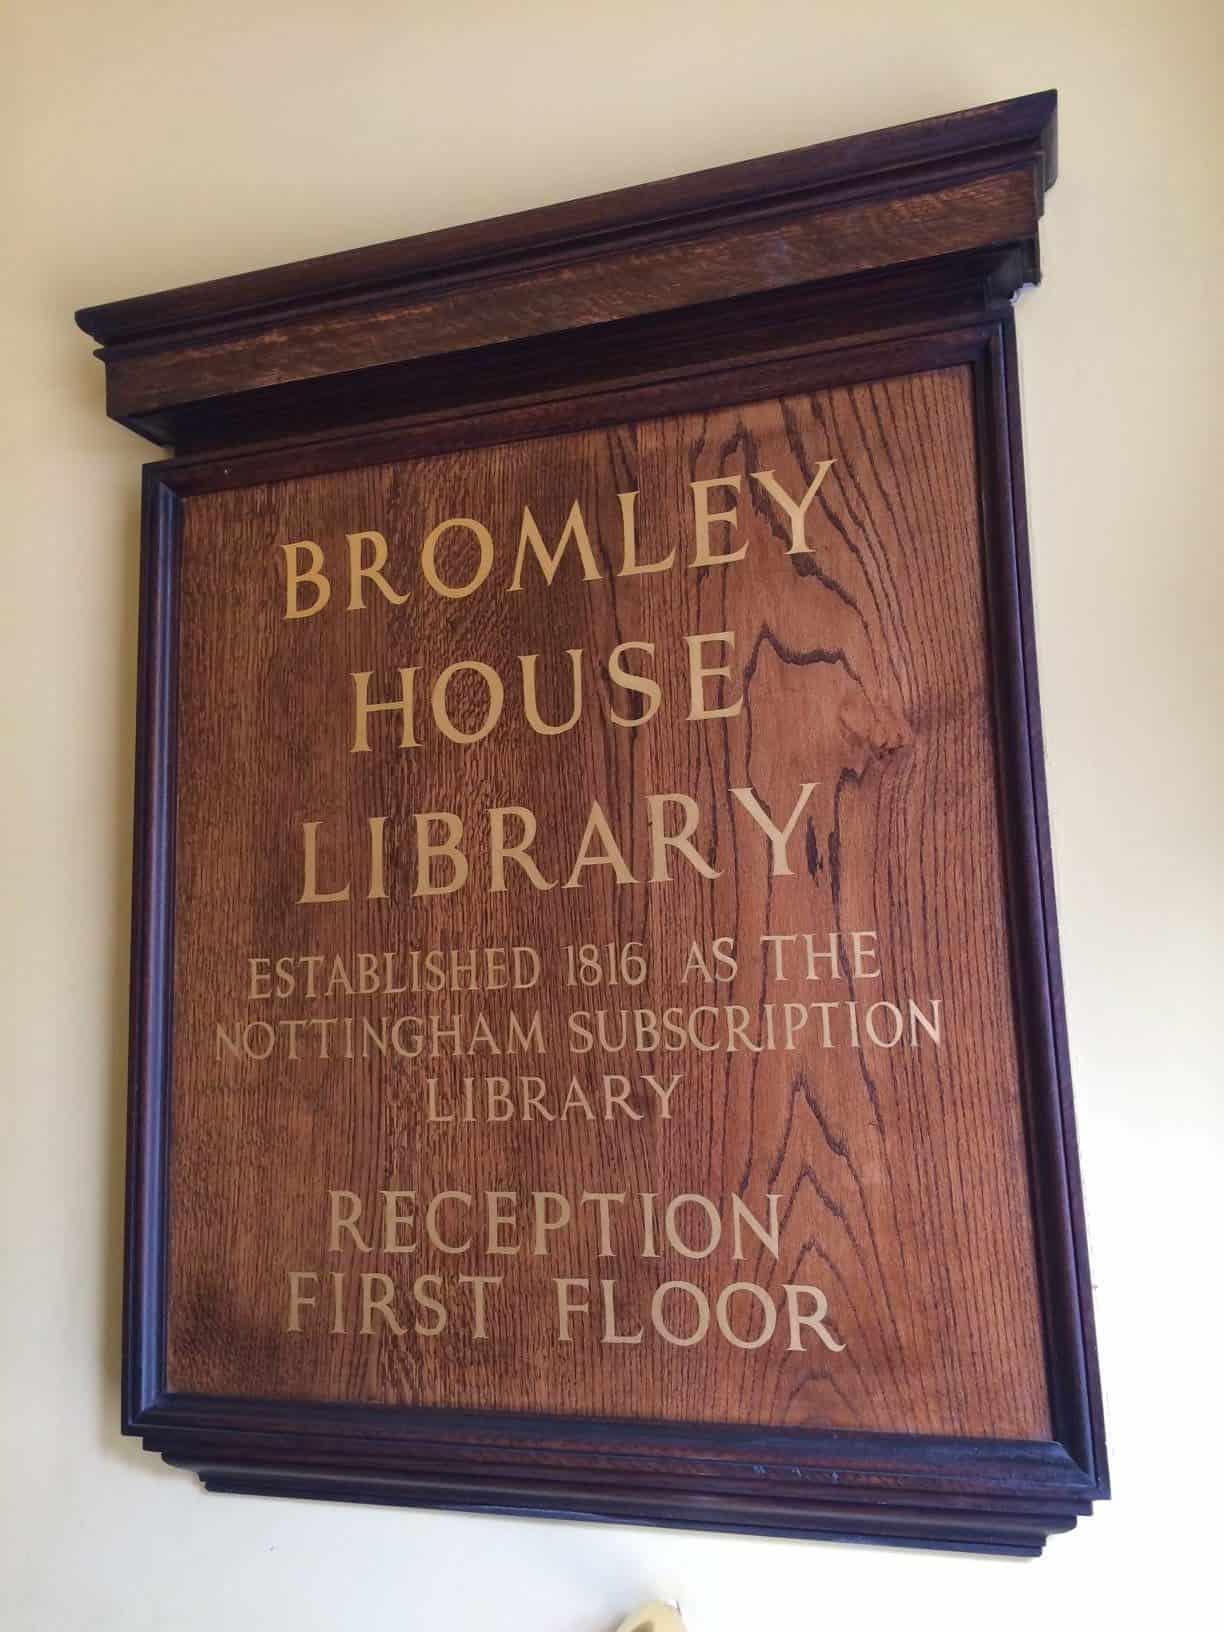 Bromley House library Nottignham